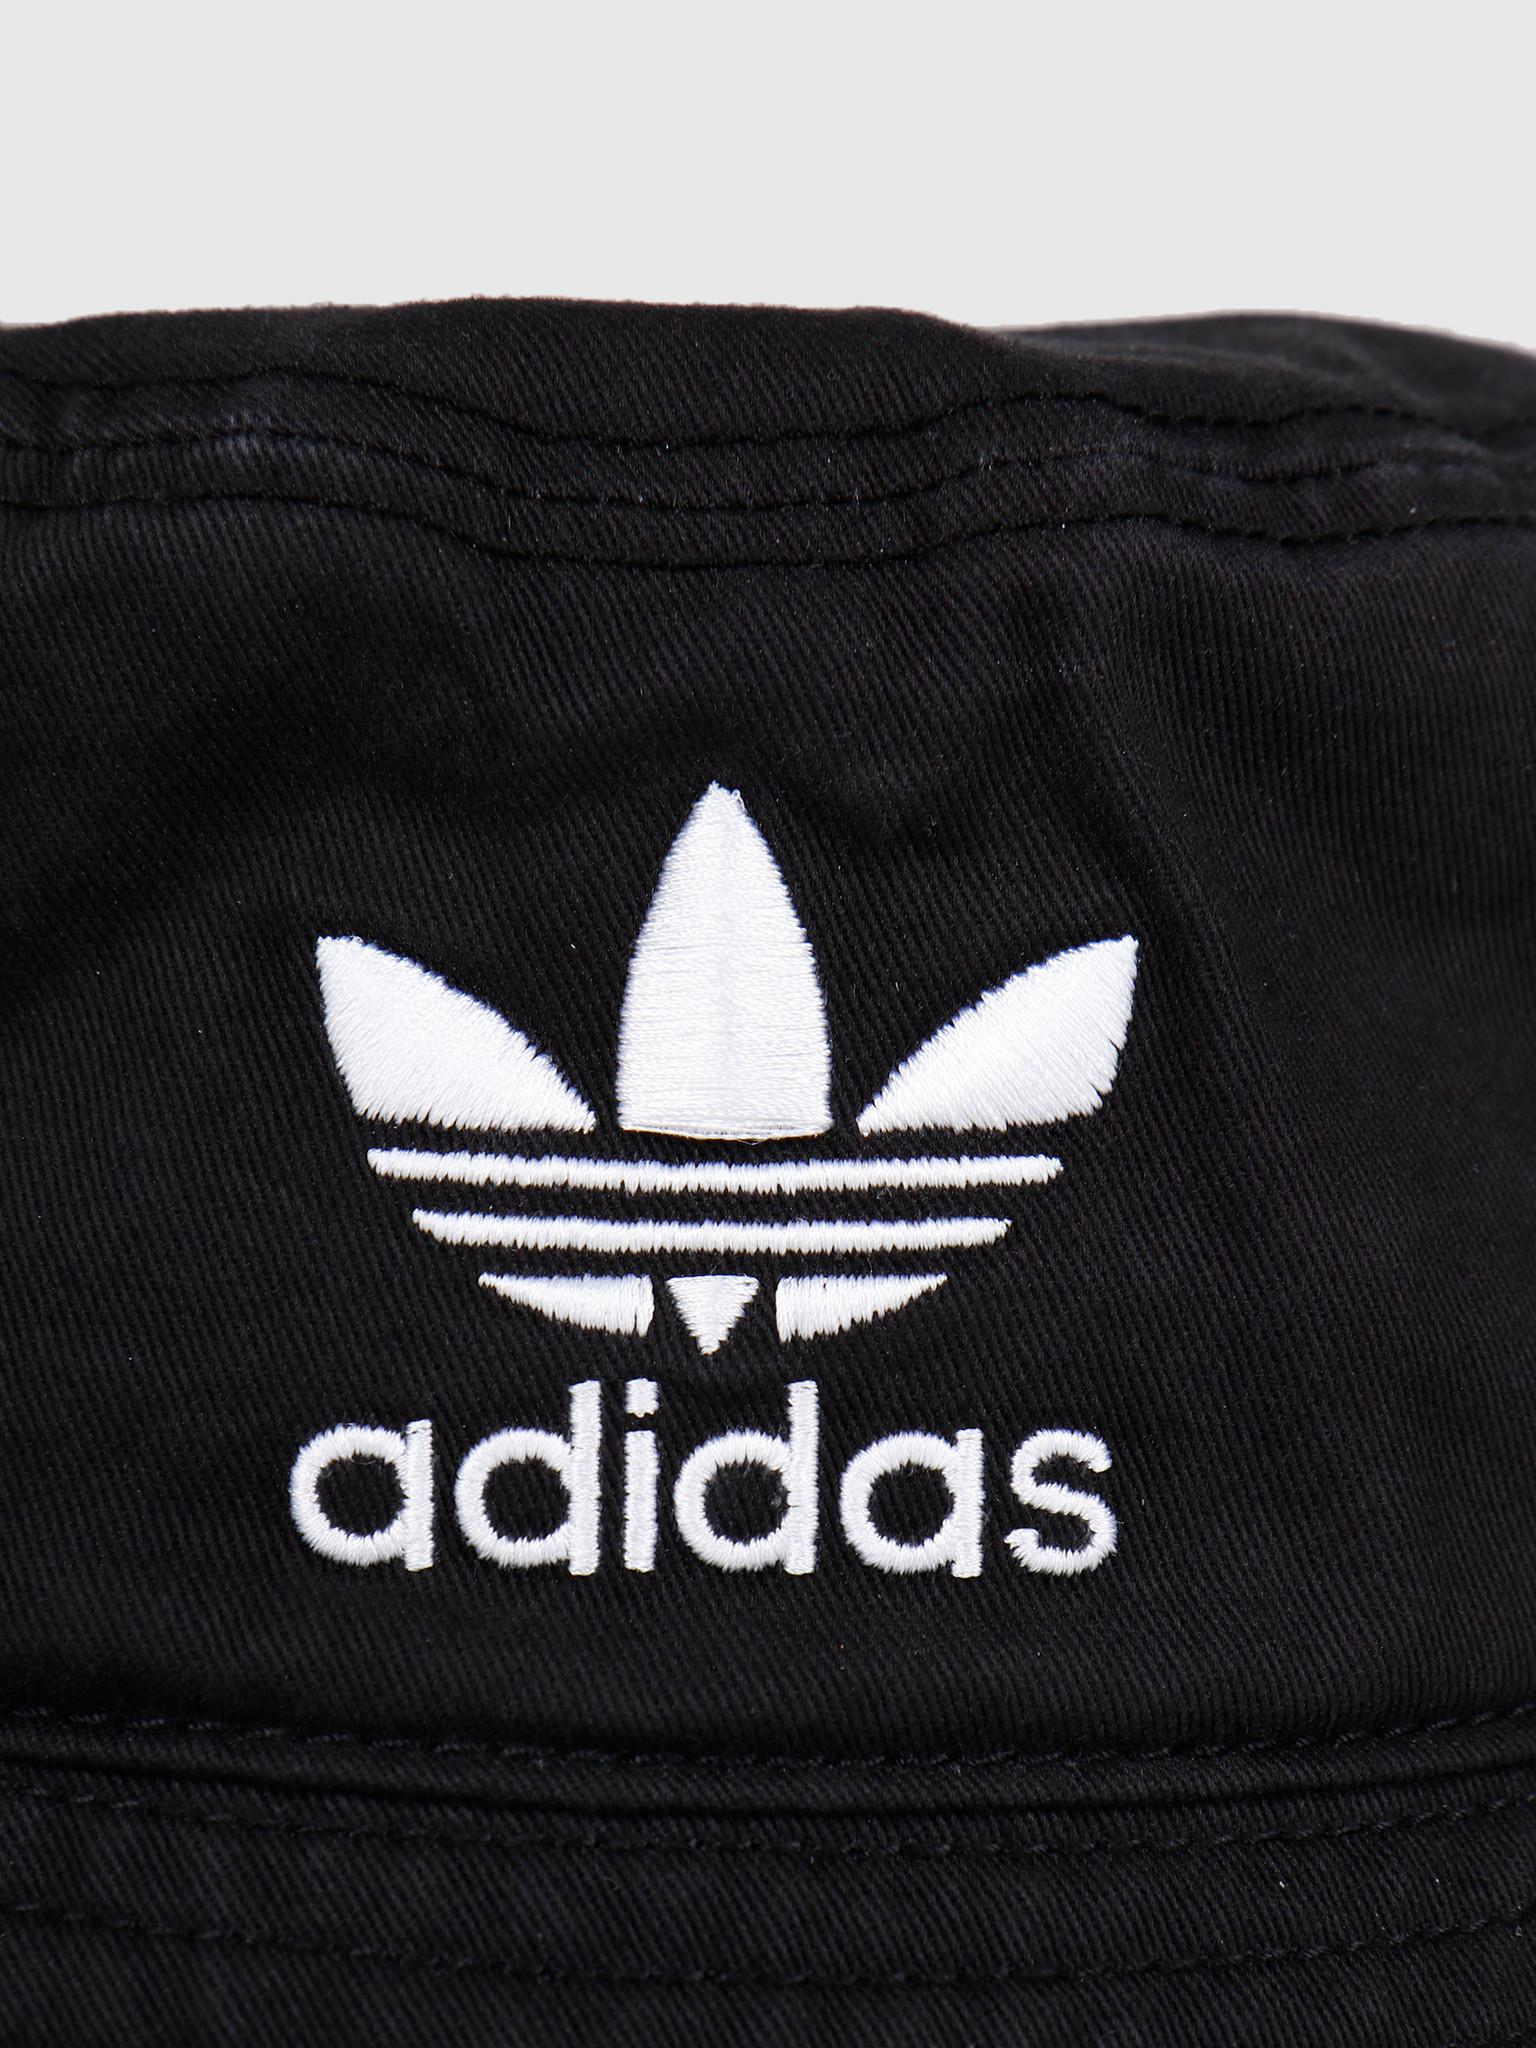 adidas adidas Bucket Hat Ac Black White DV0863